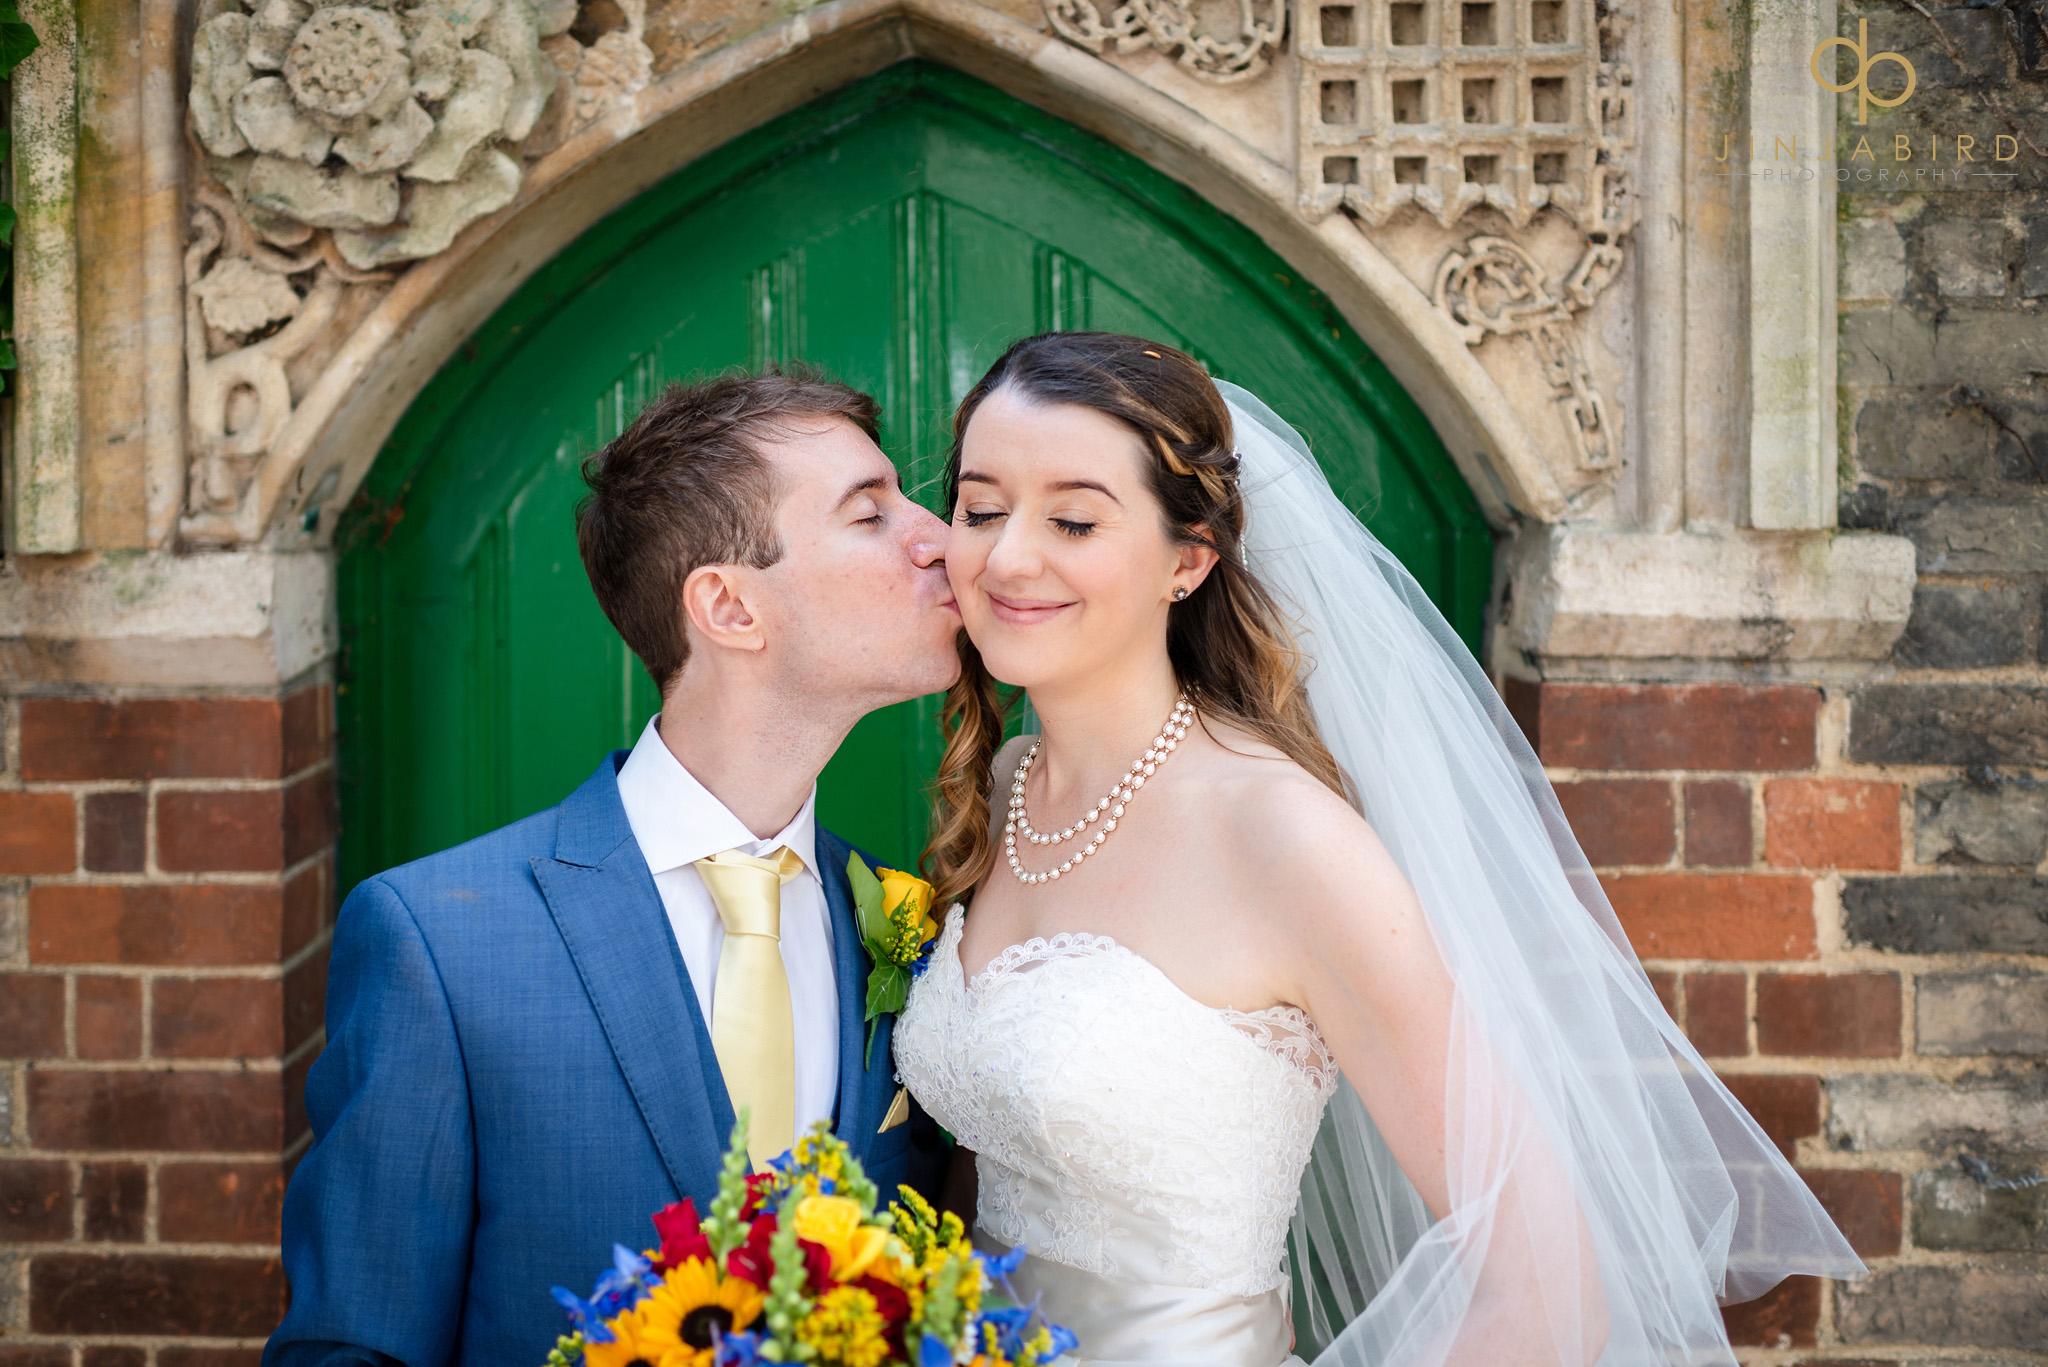 natural wedding photography cambridge